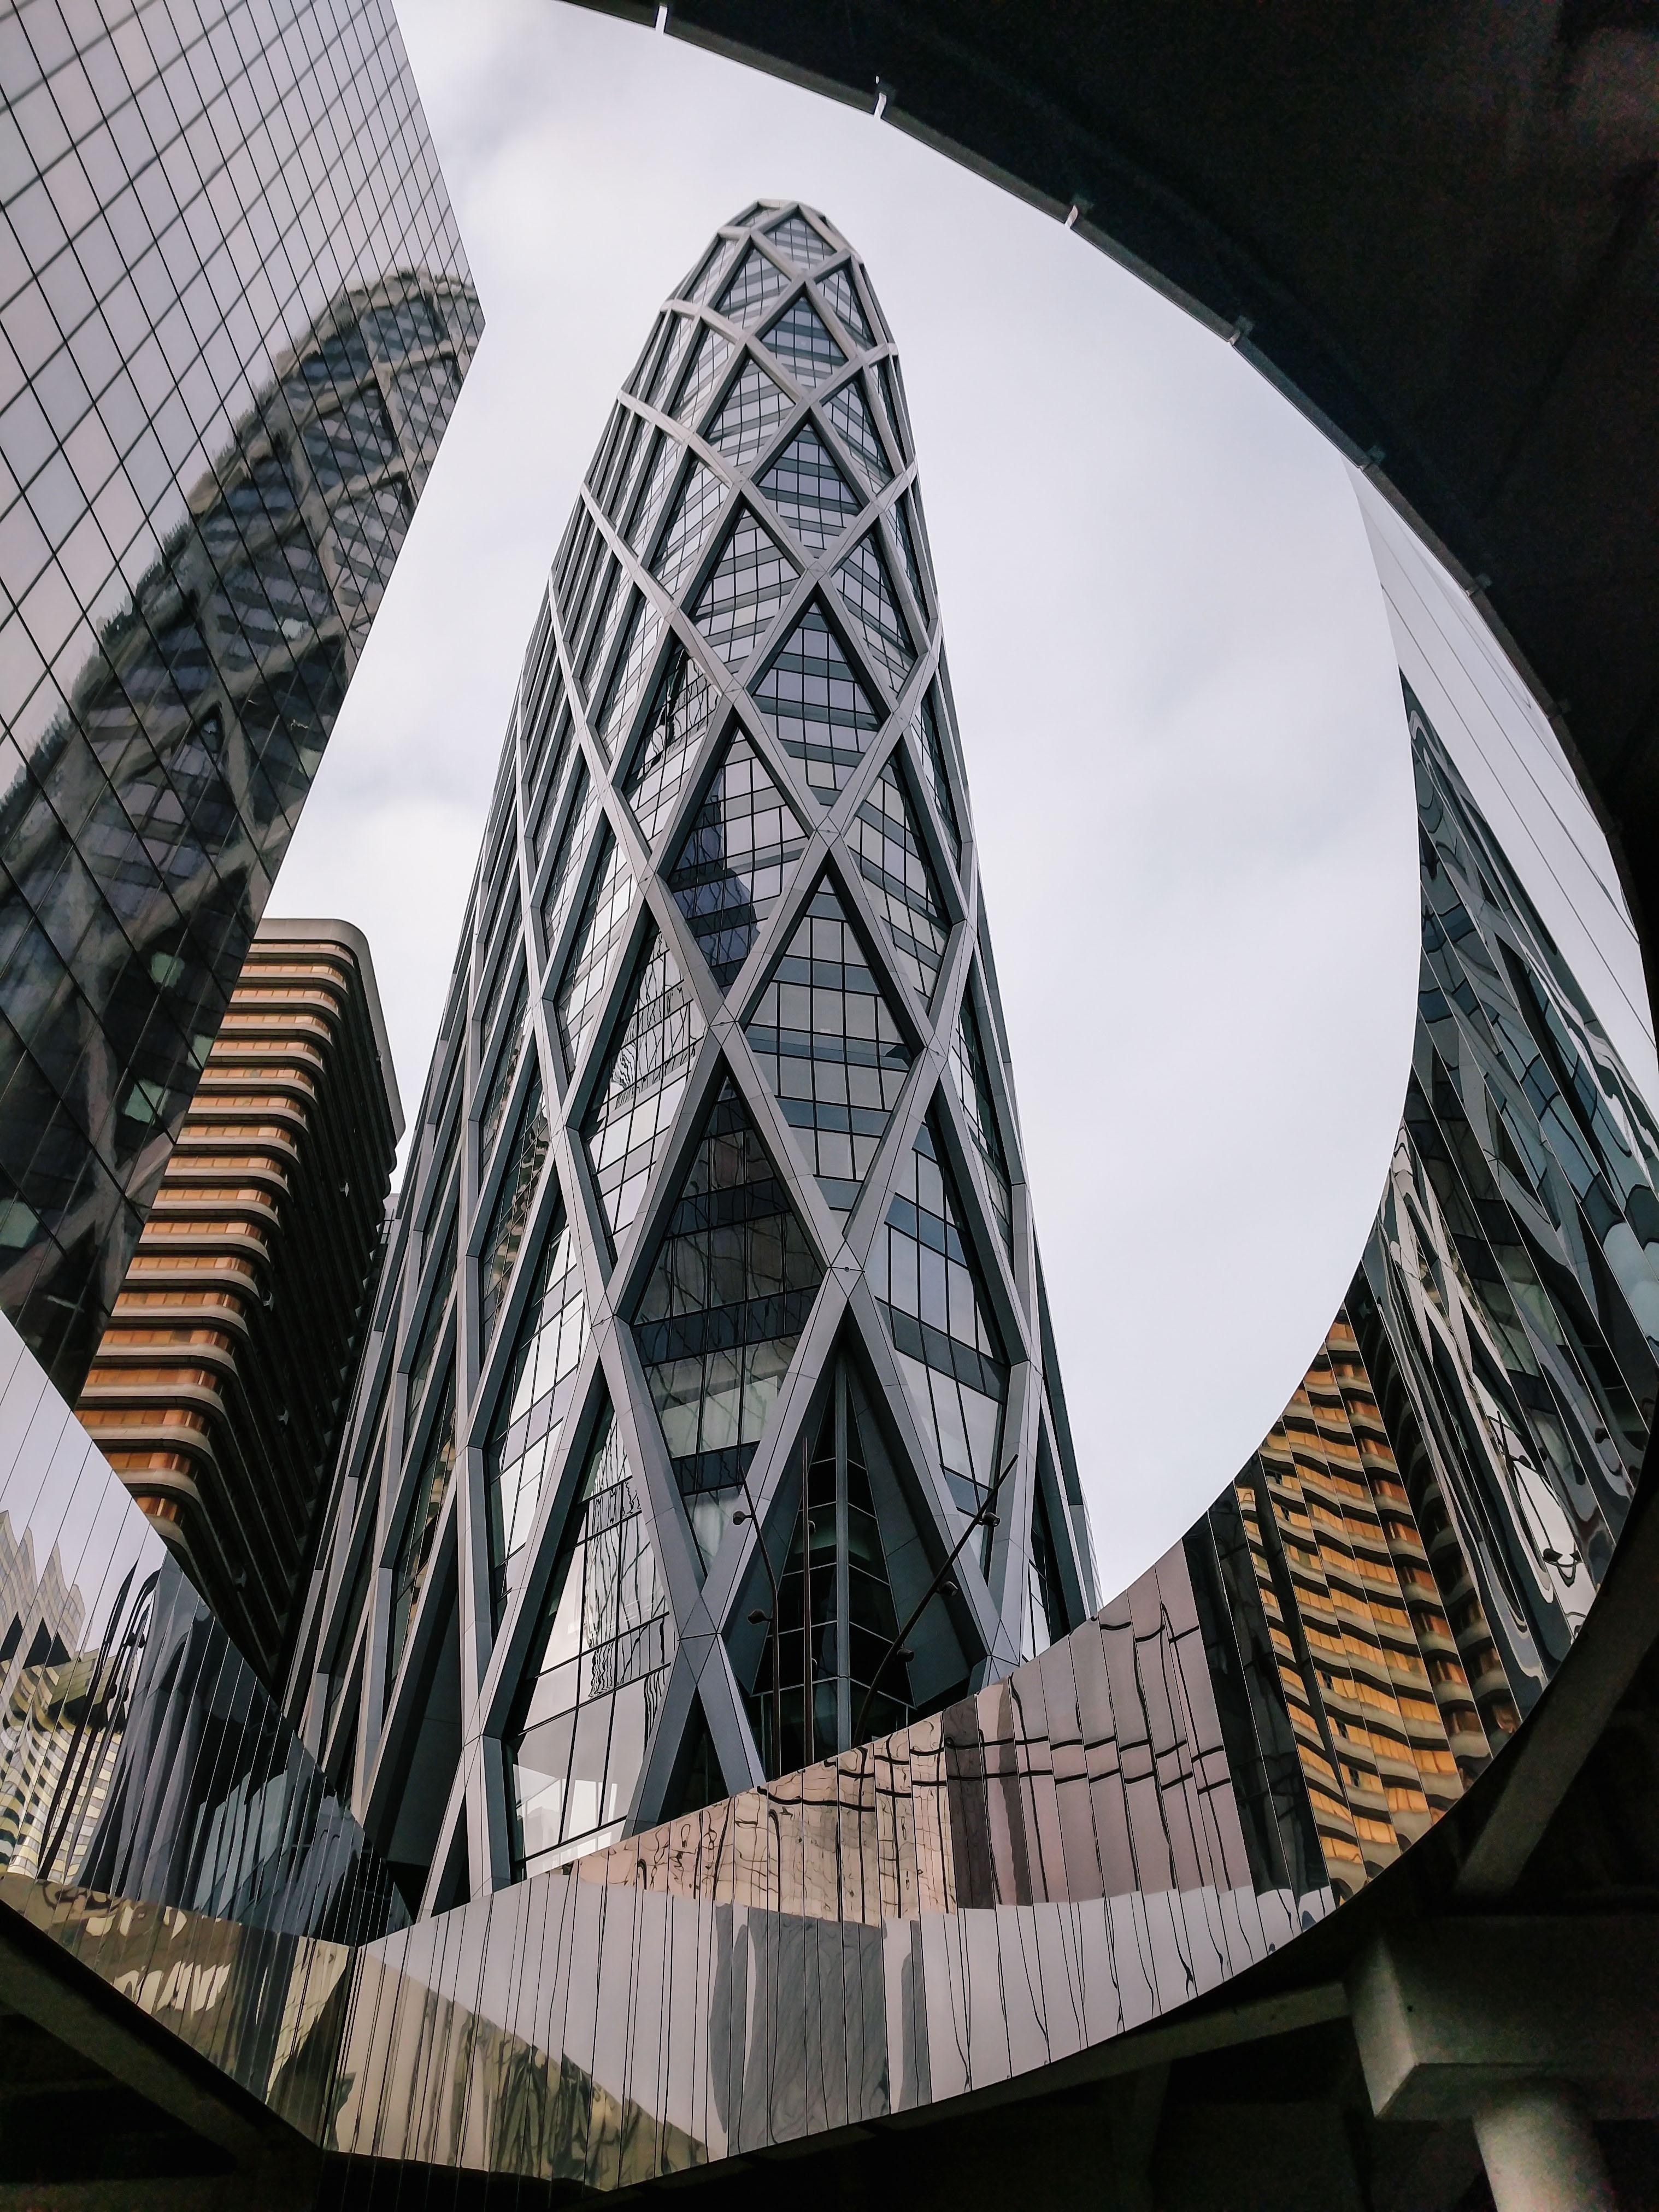 A tall modern skyscraper with a latticework facade in Paris